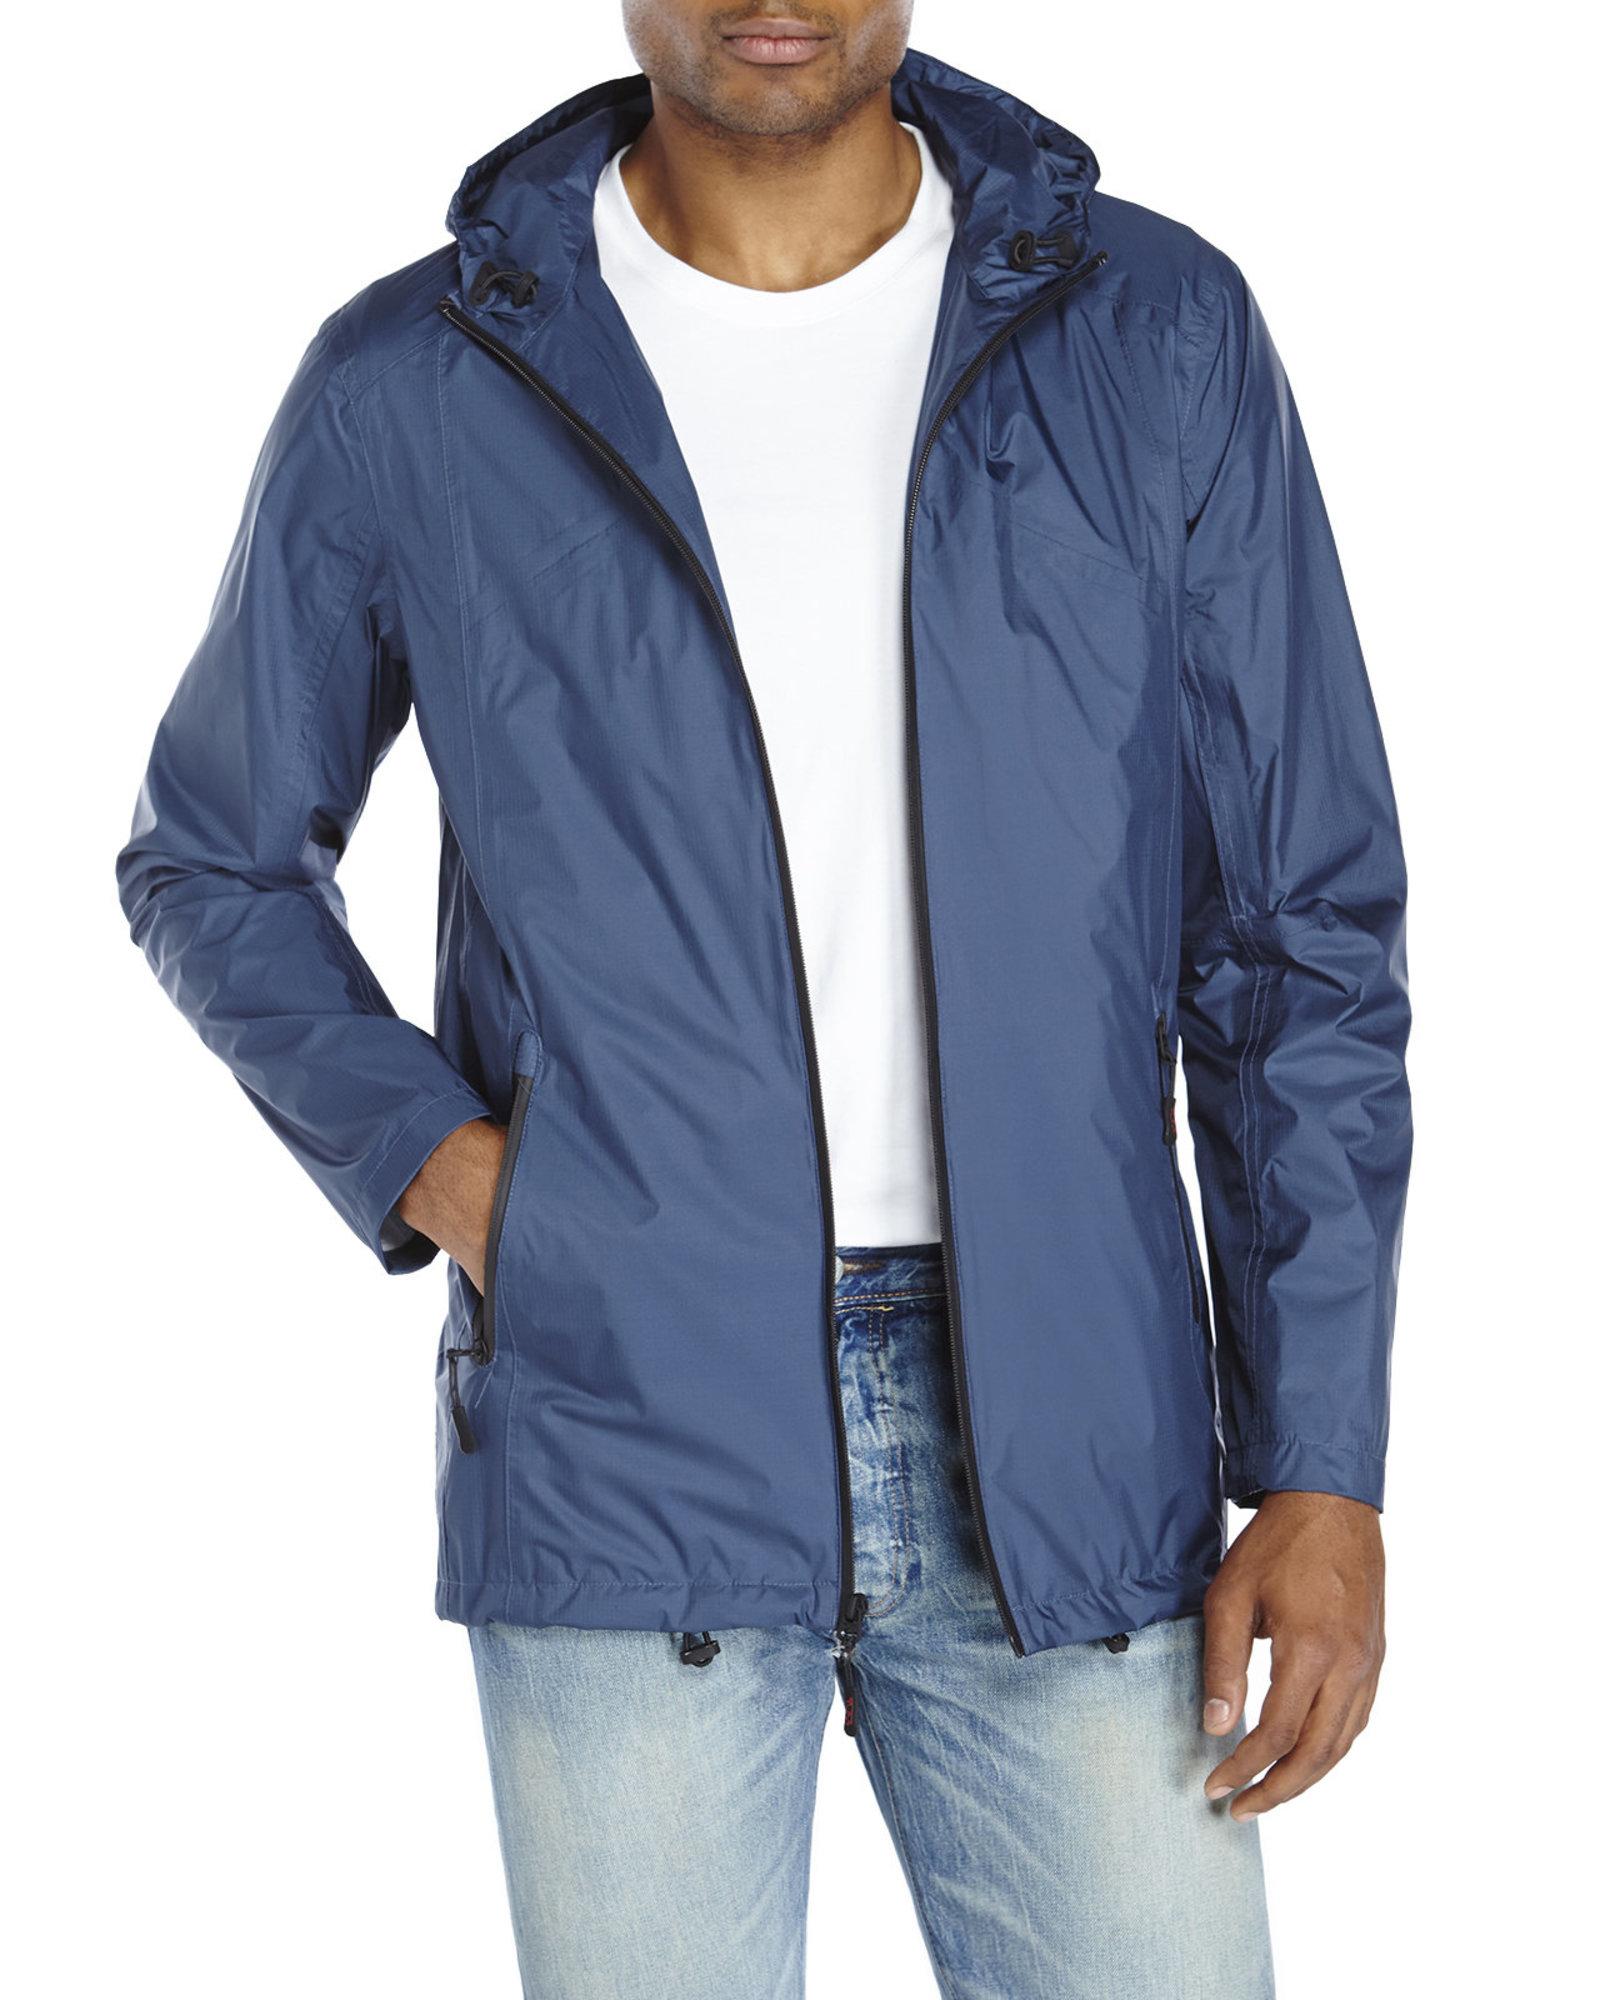 Tumi Packable Nylon Rain Jacket in Blue | Lyst